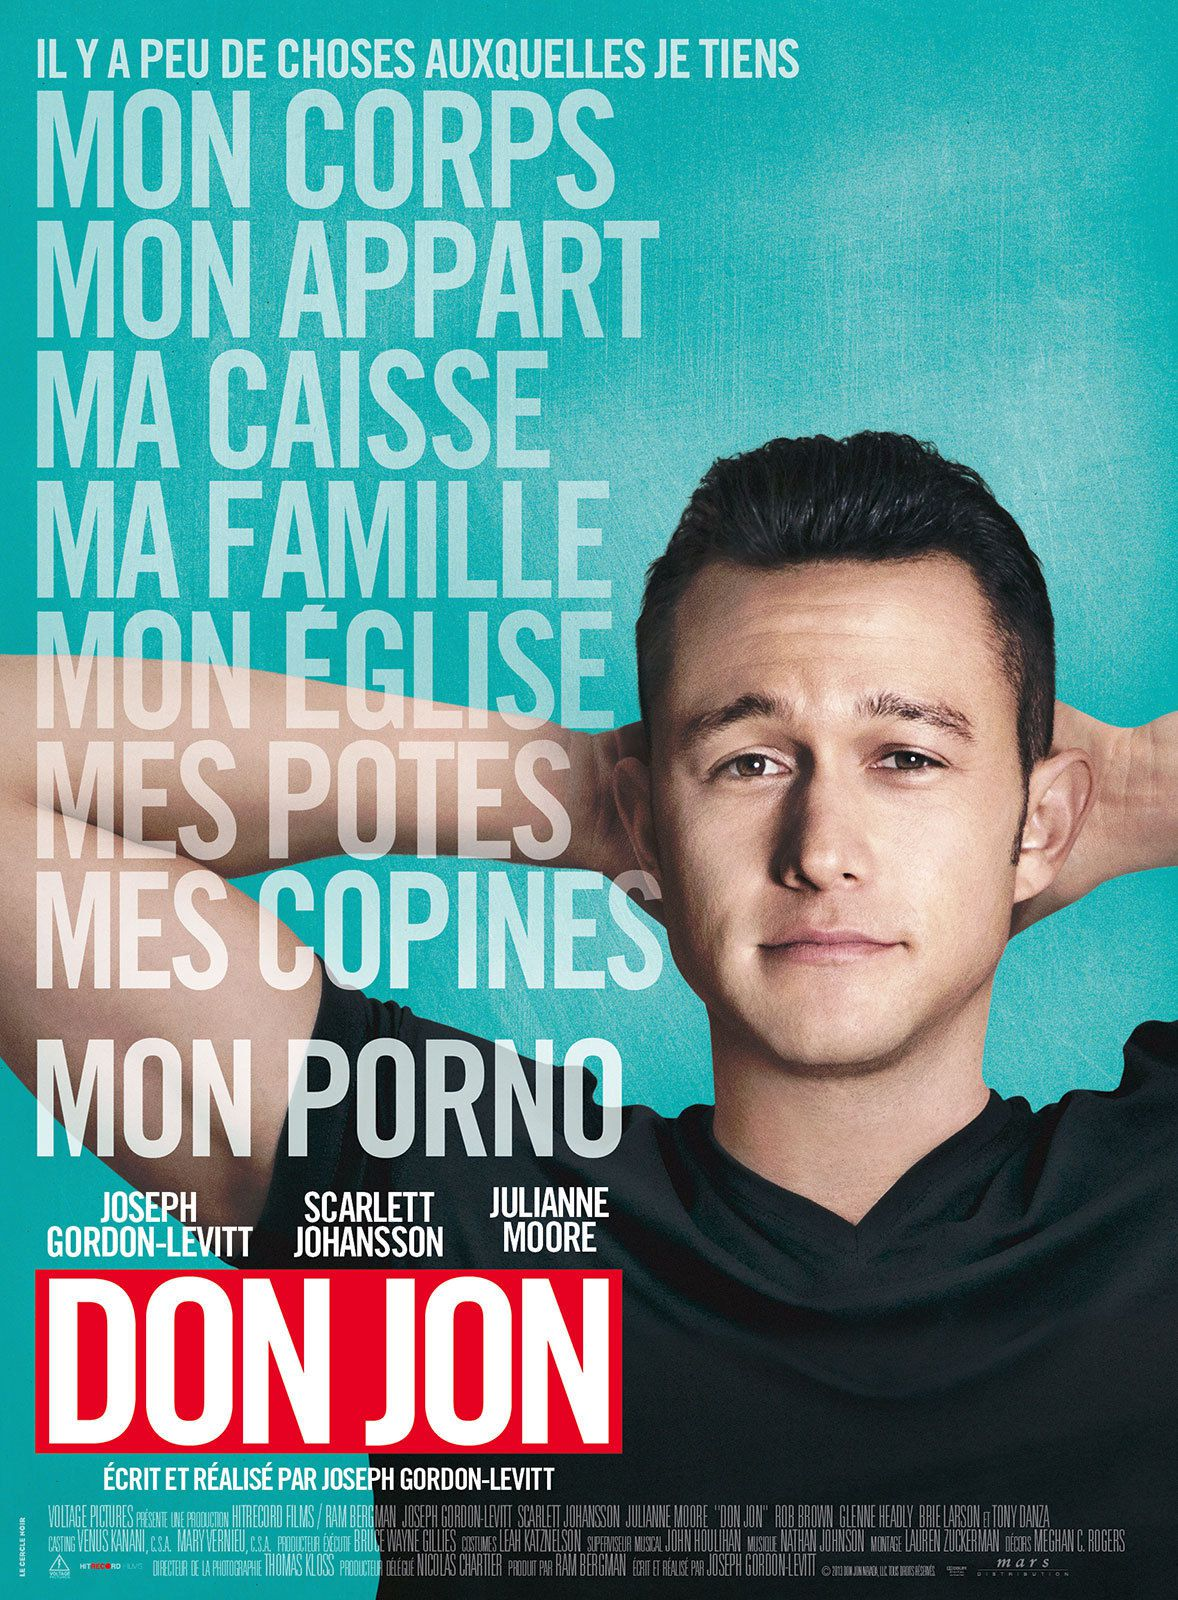 Don Jon - Film (2013)